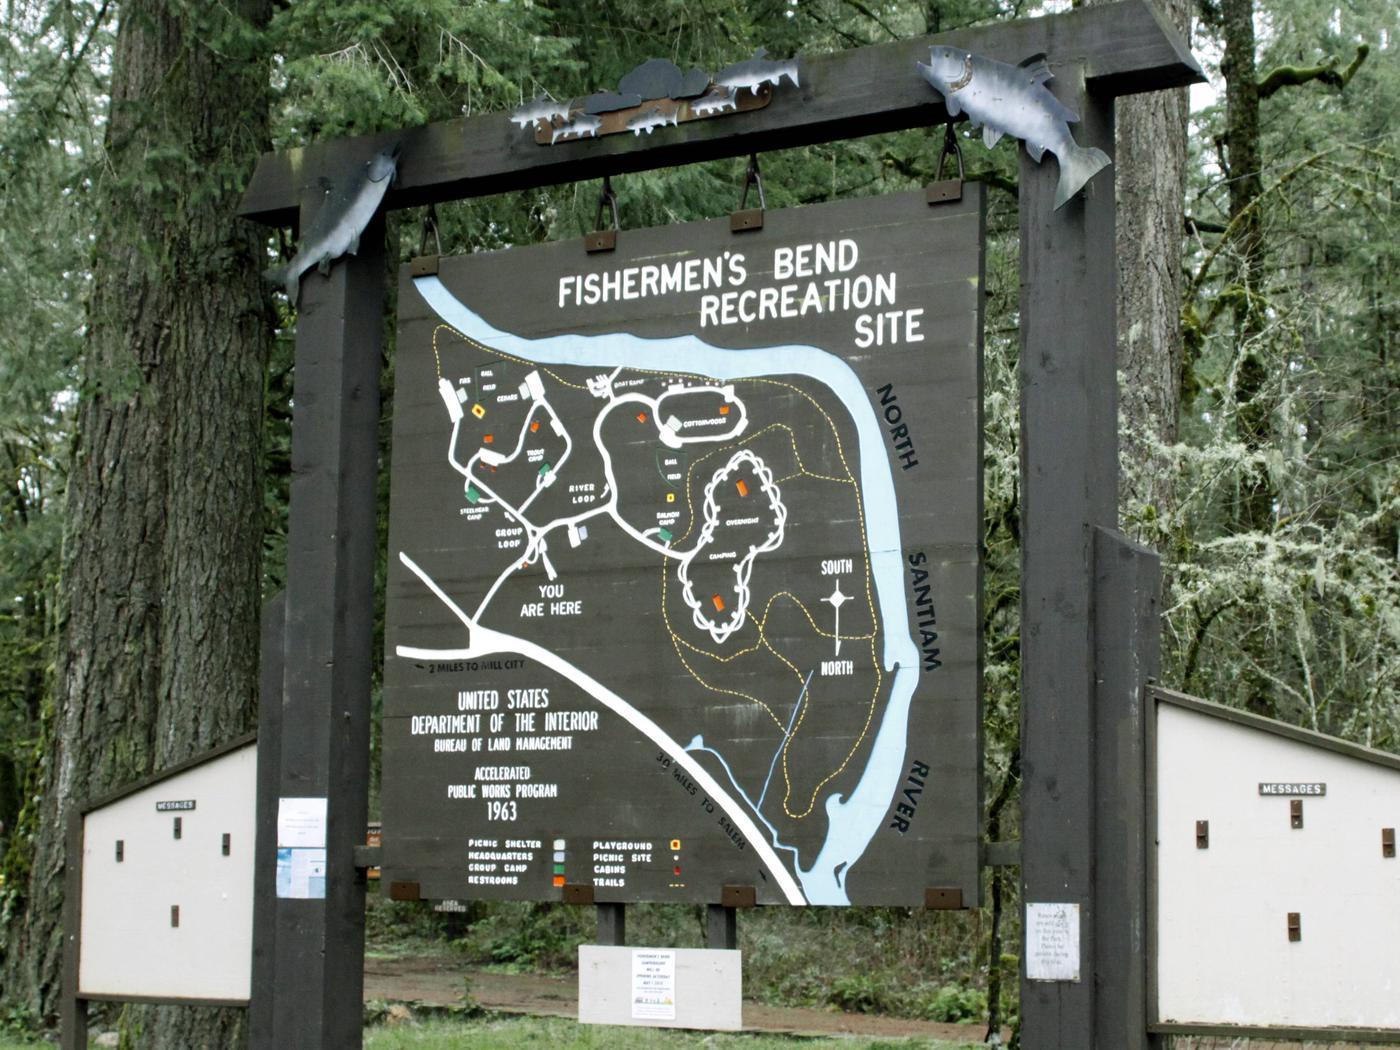 Fishermen's Bend Recreation Site wooden map